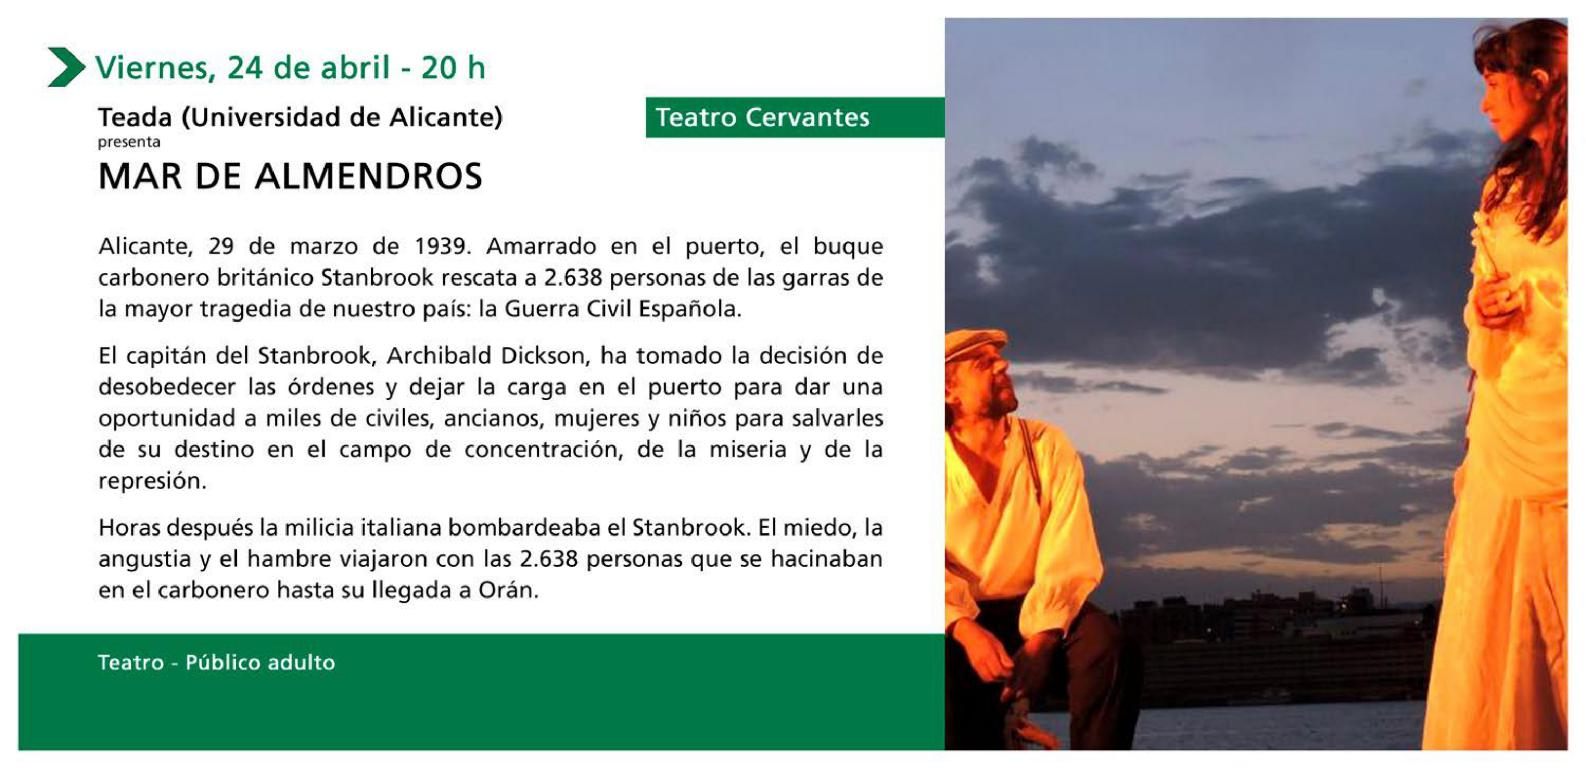 Programacin-Teatro-Cervantes-2020_page-0010.jpg